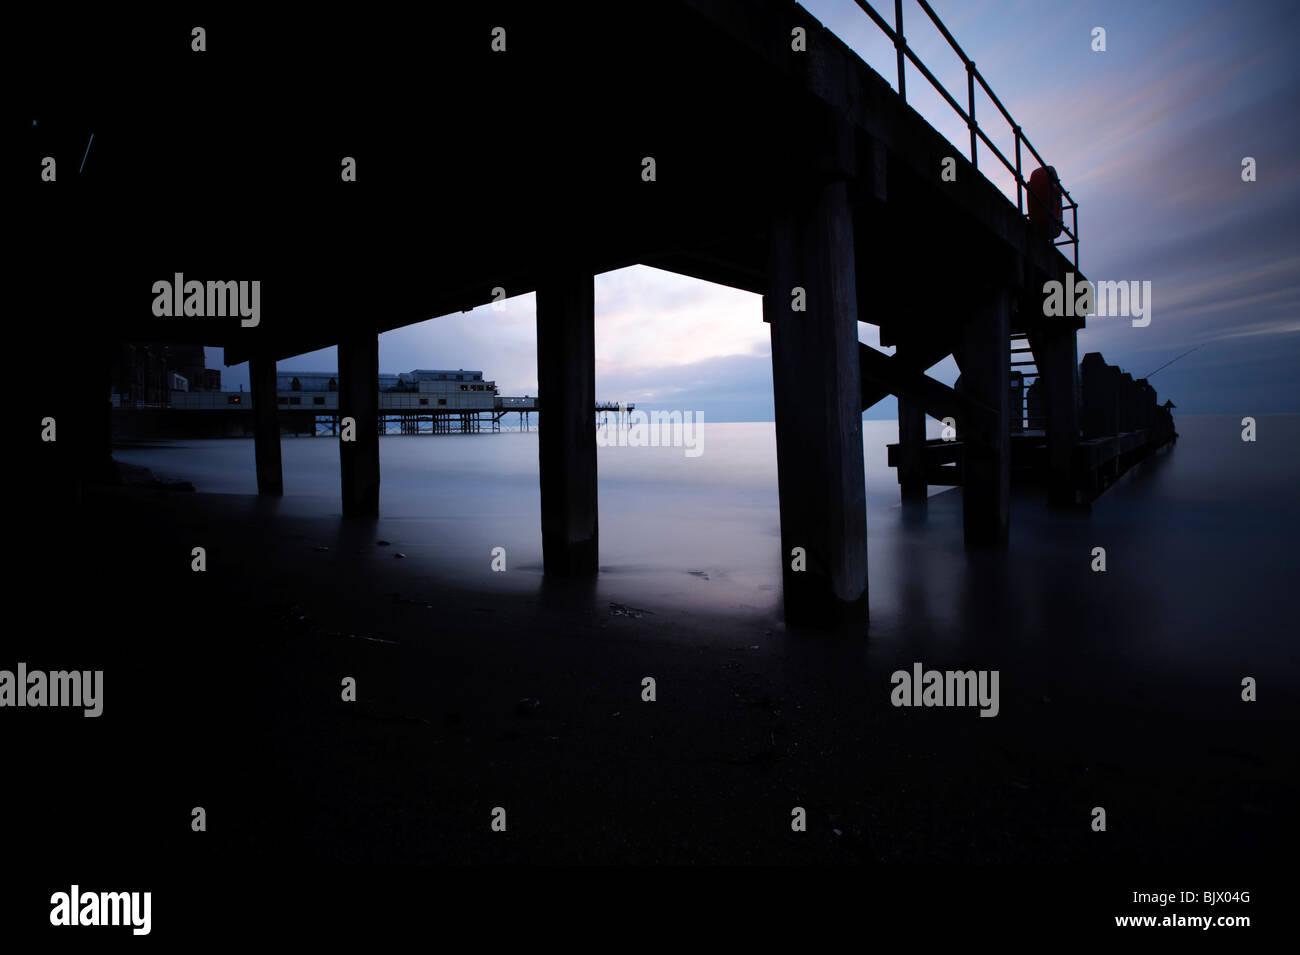 Aberystwyth pier, promenade and seashore at dusk, long exposure image, Wales UK - Stock Image